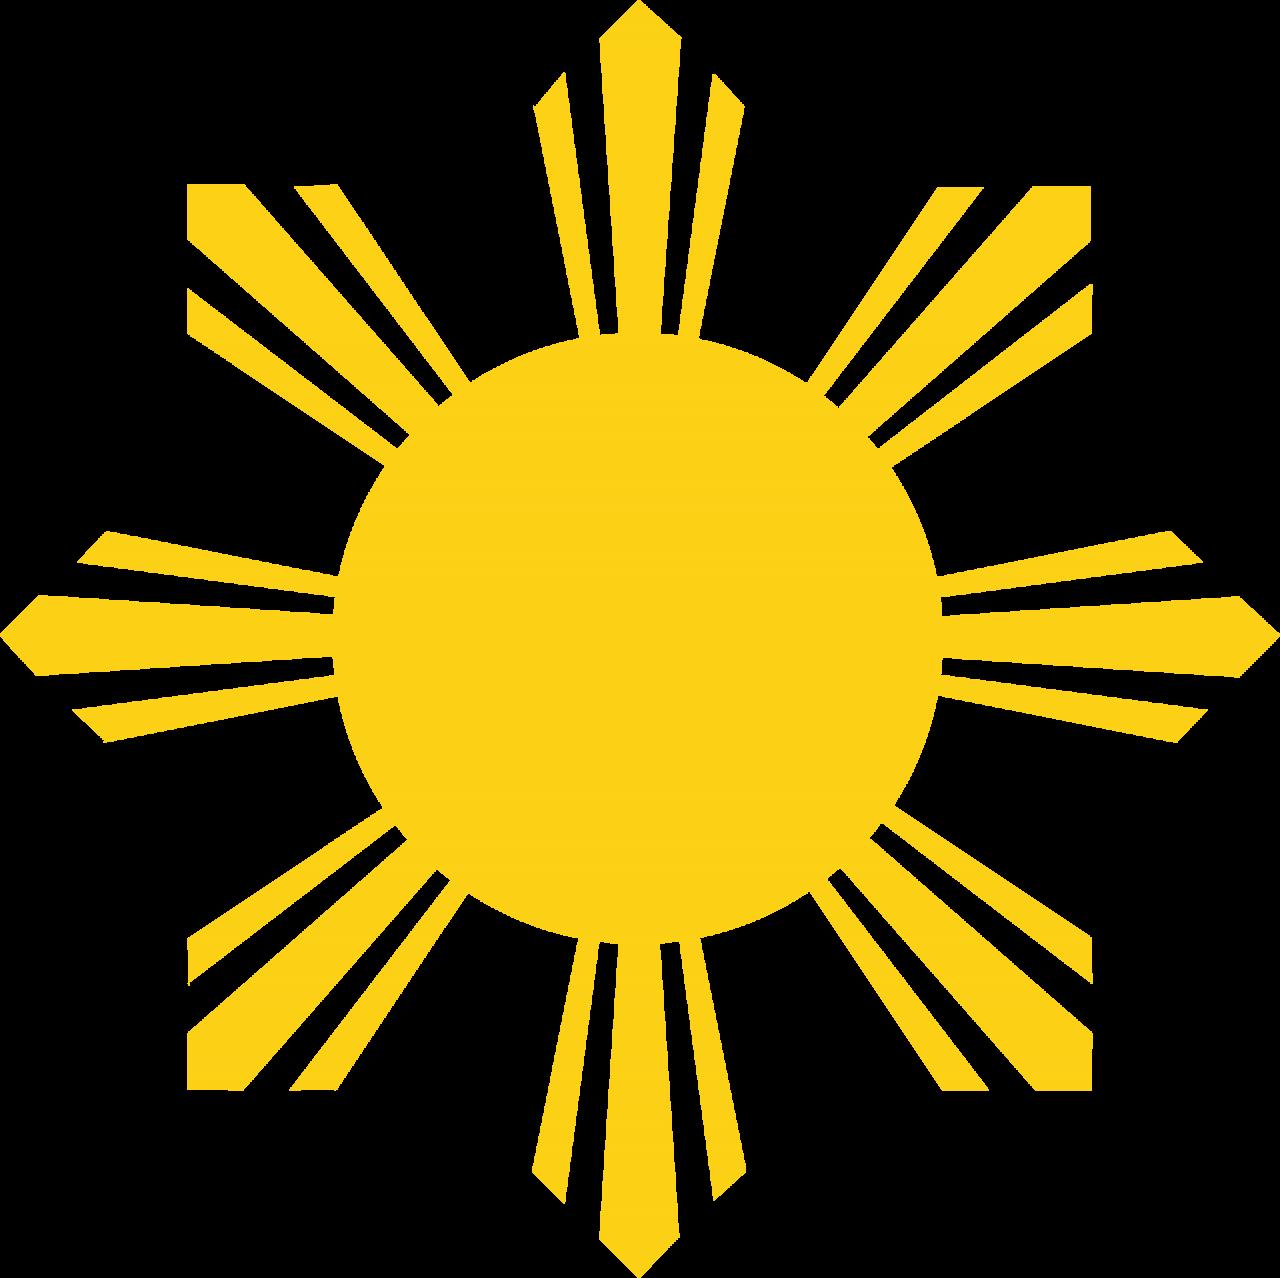 Sunshine Clipart PNG Image